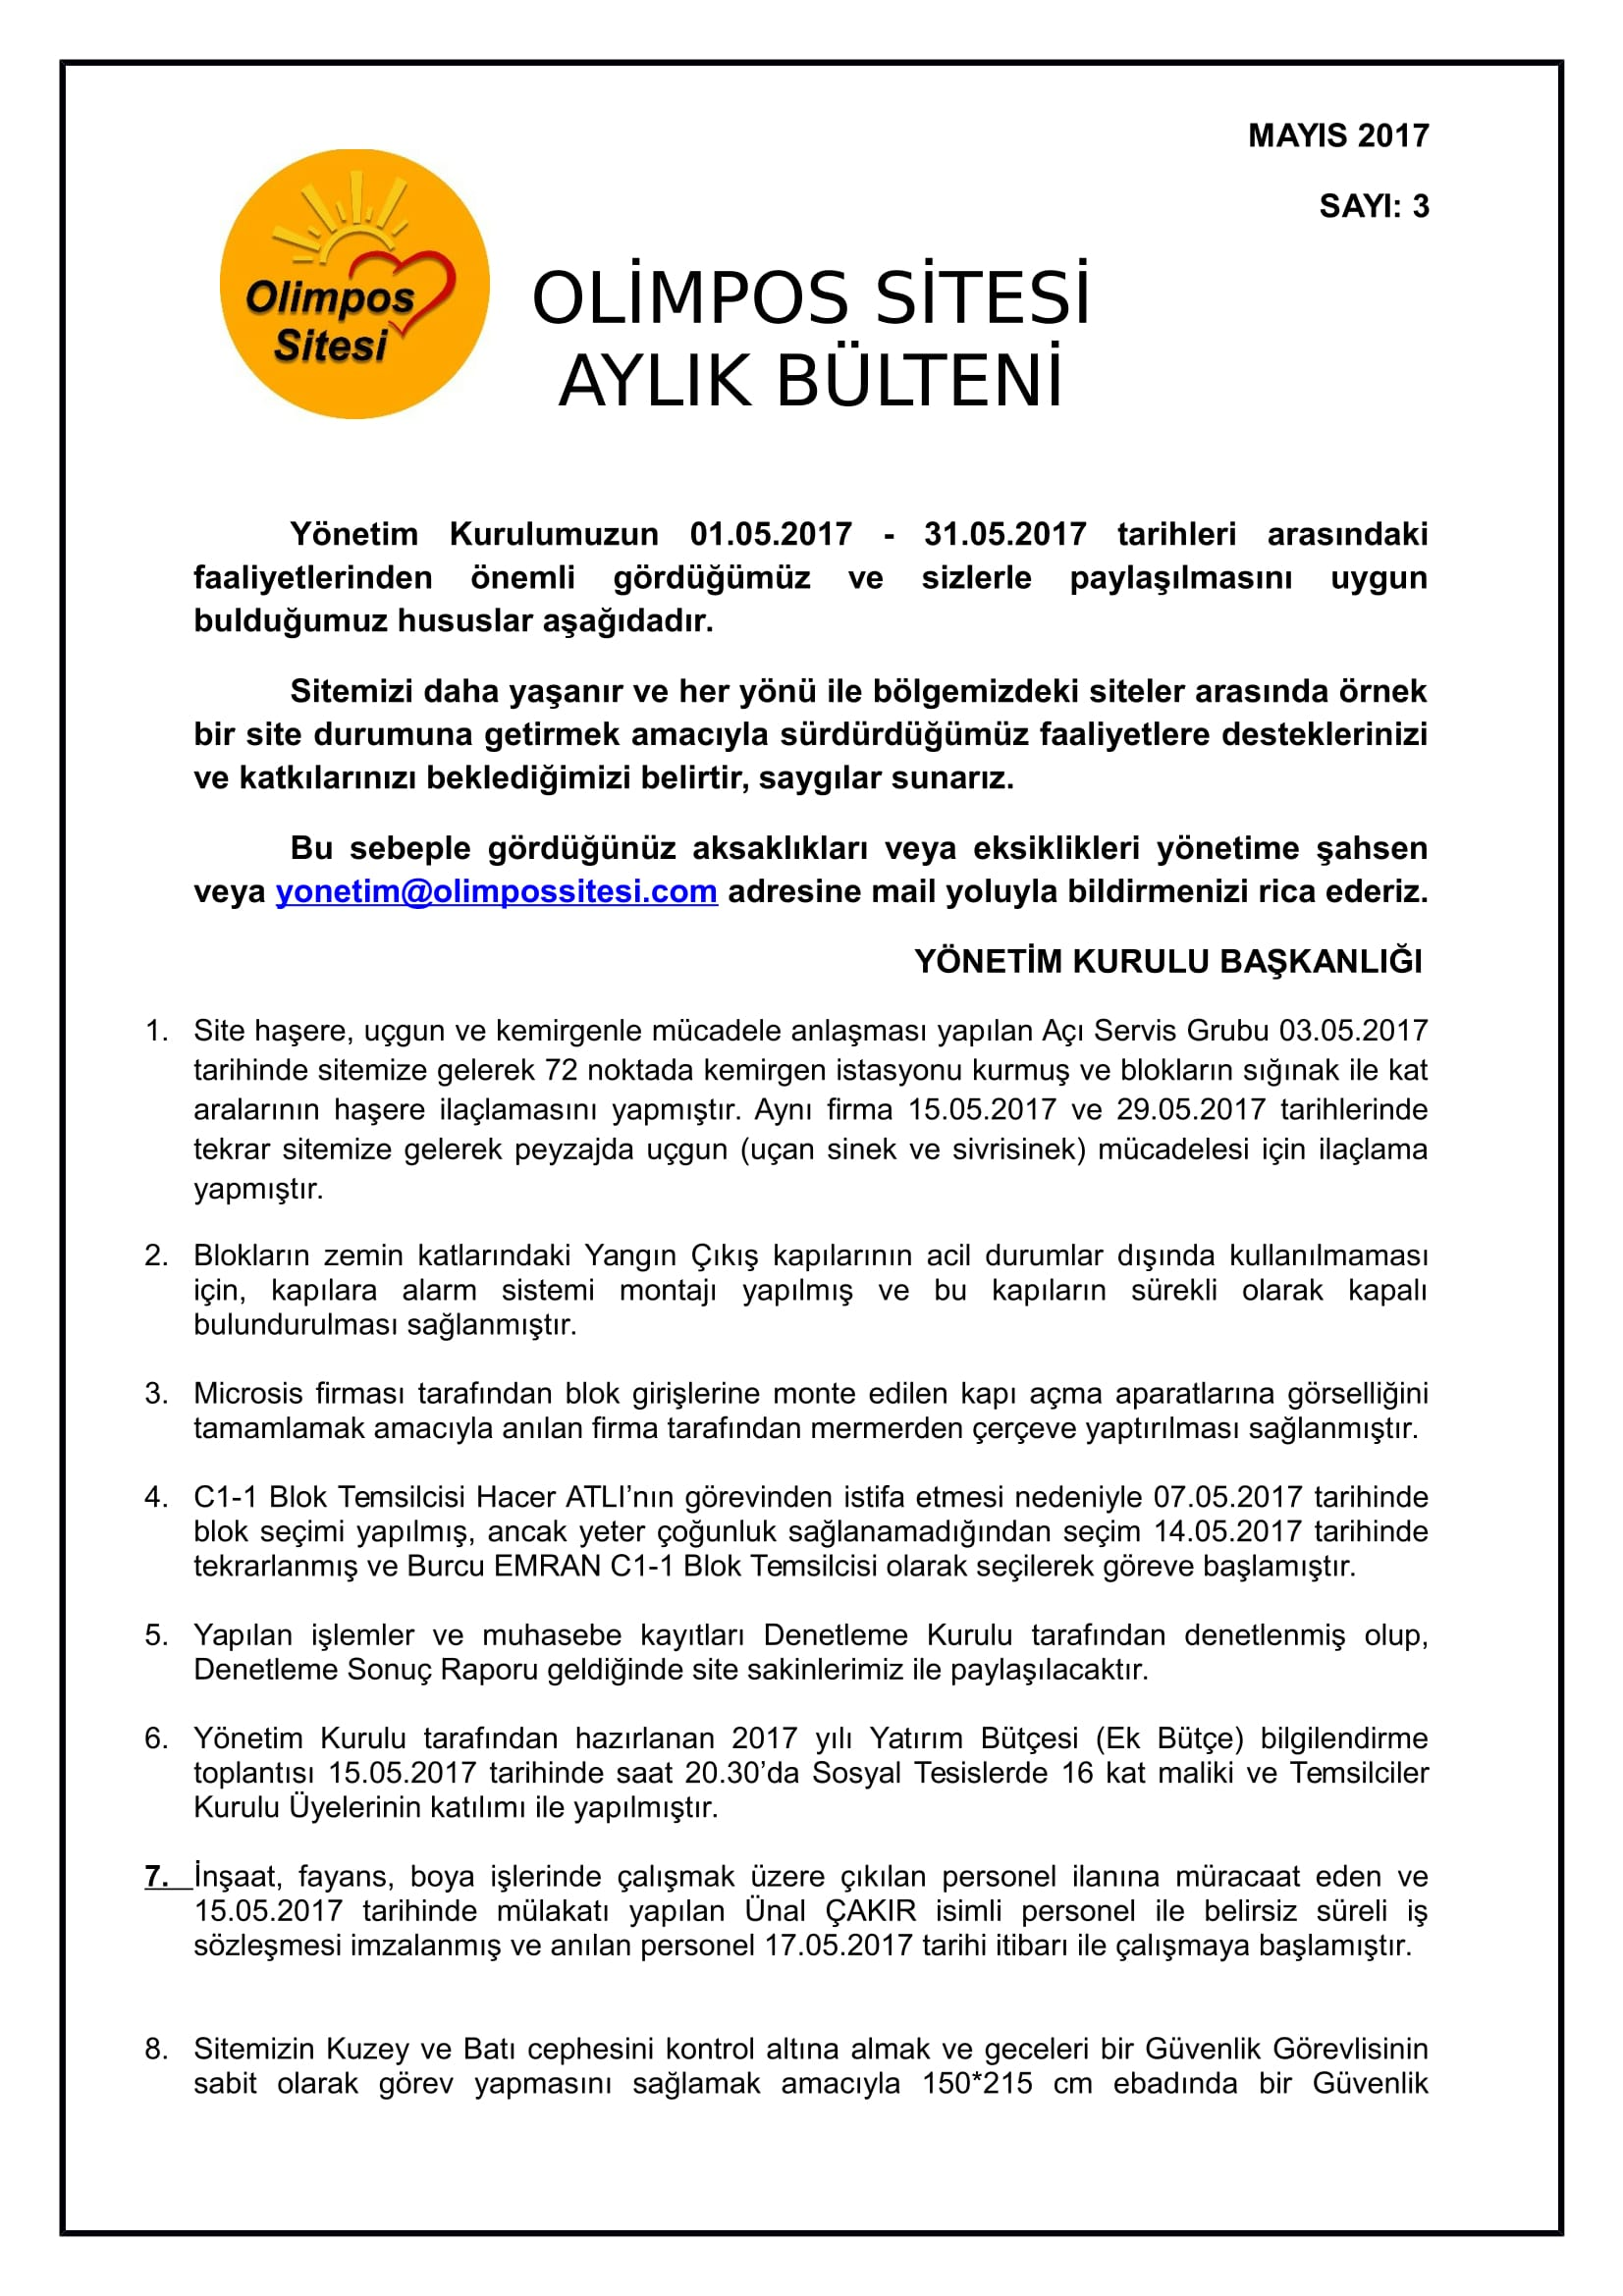 BÜLTEN NO 2 MAYIS 2017-1